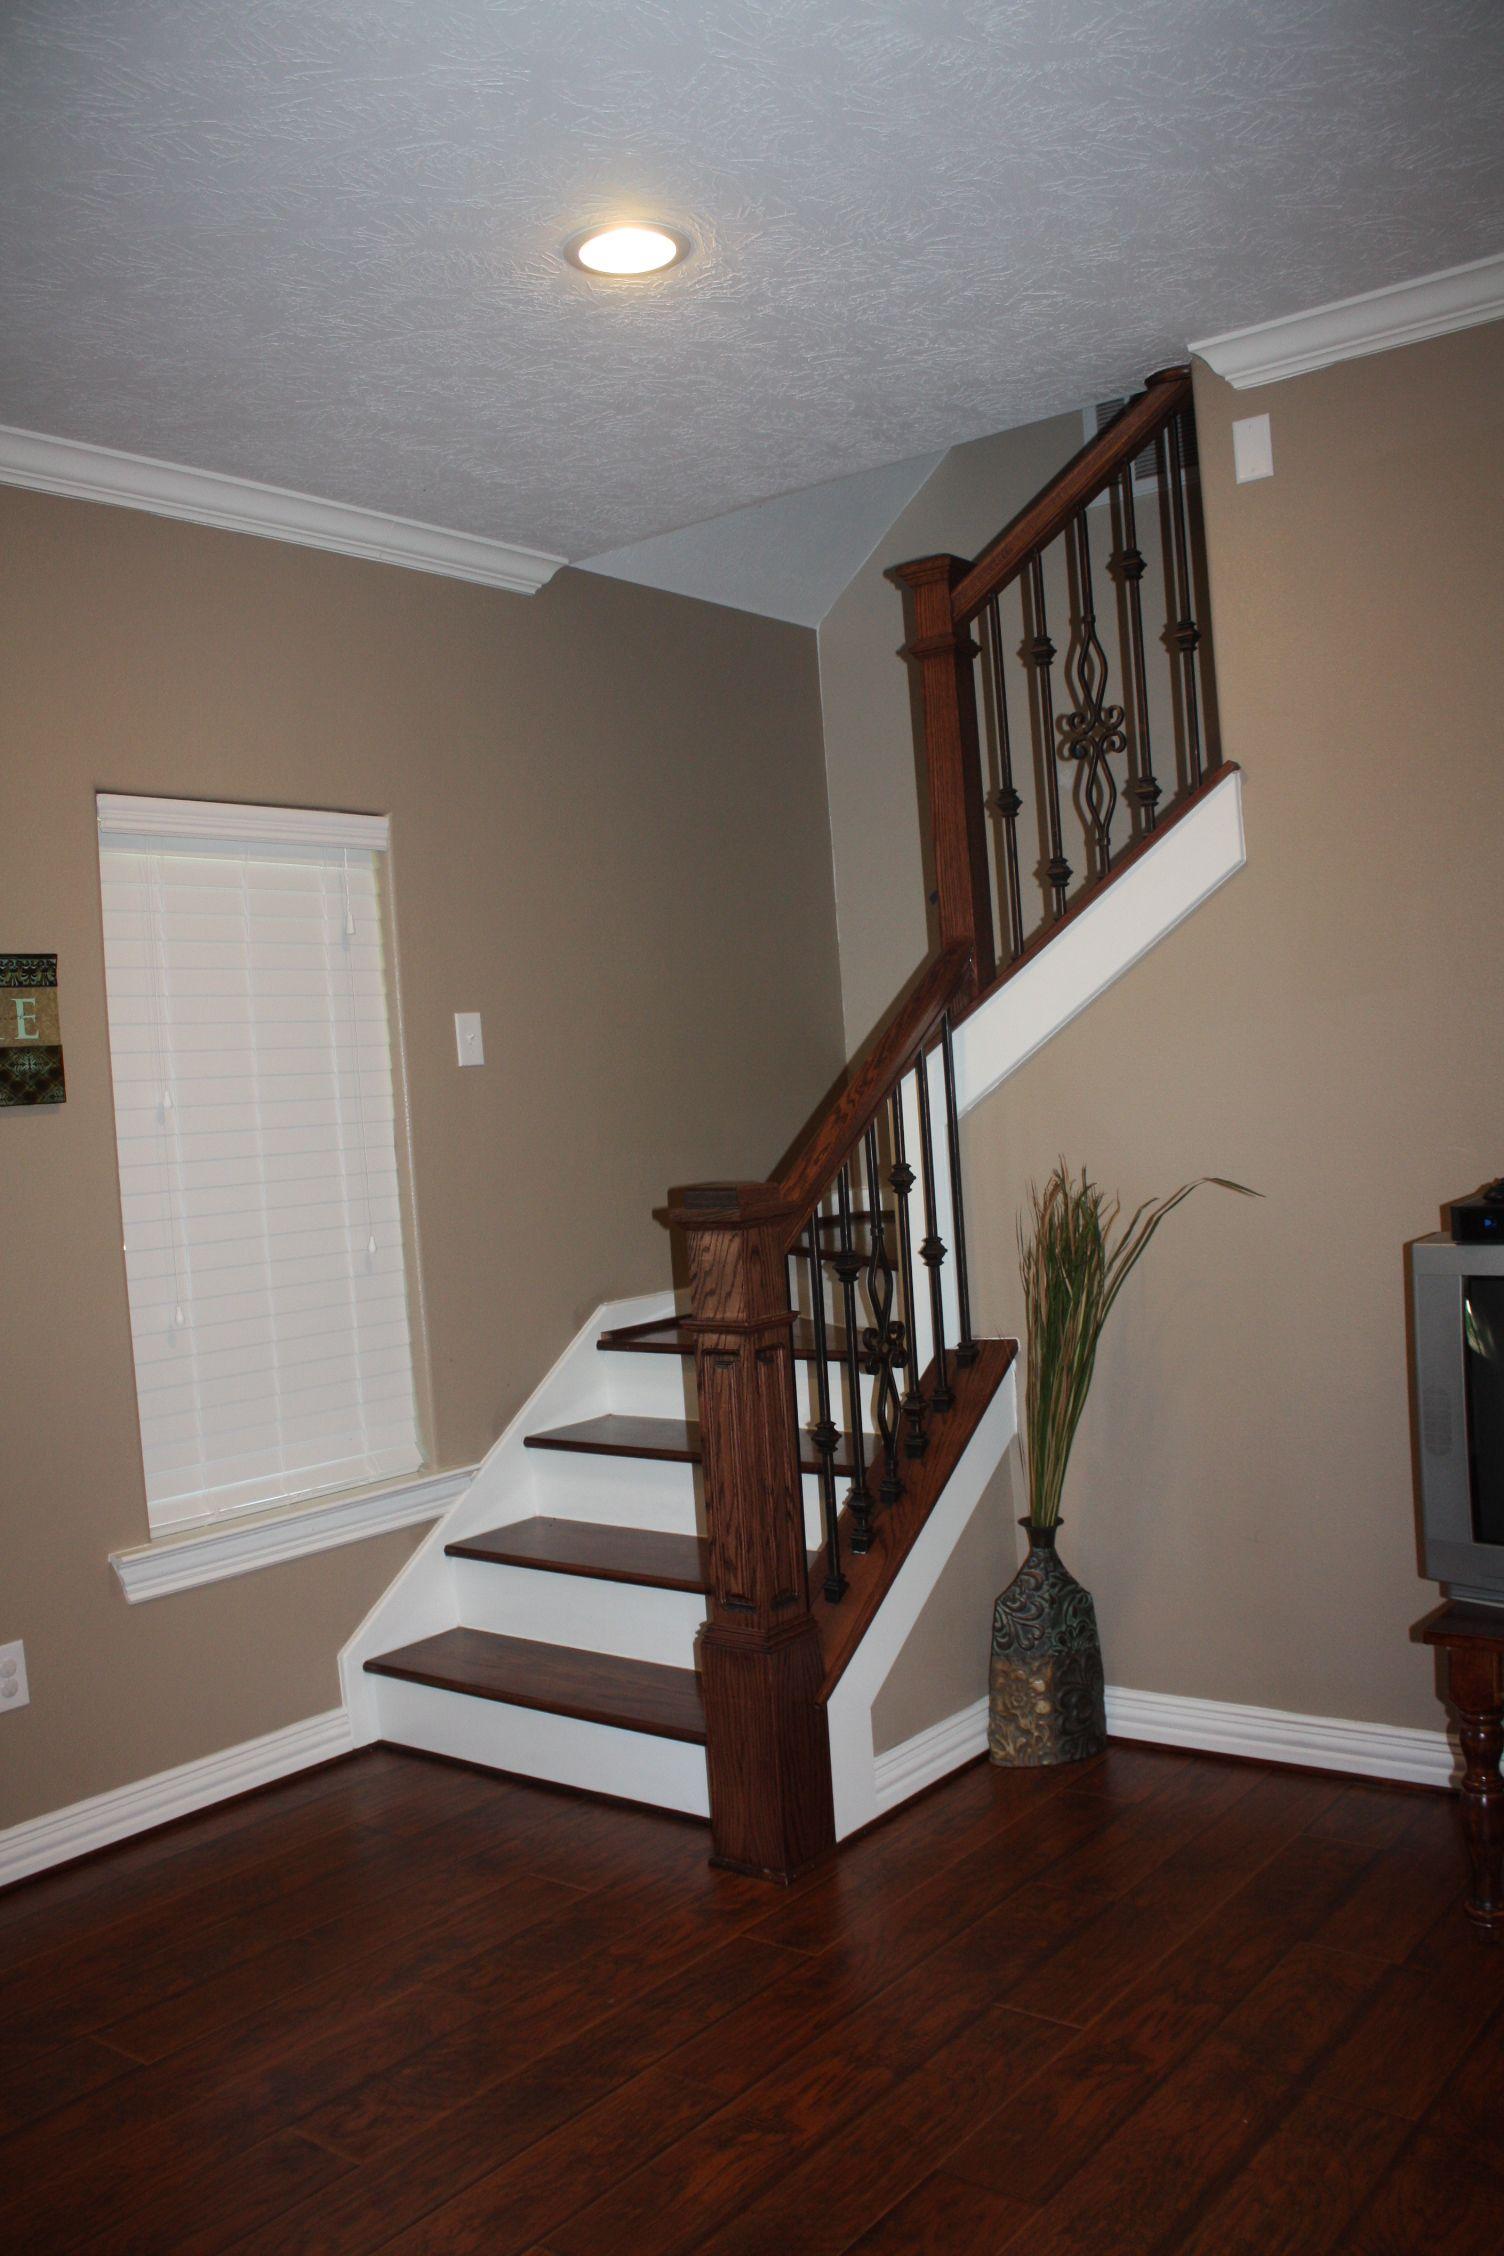 hardwood floors and stairs | my castlethe sea | pinterest